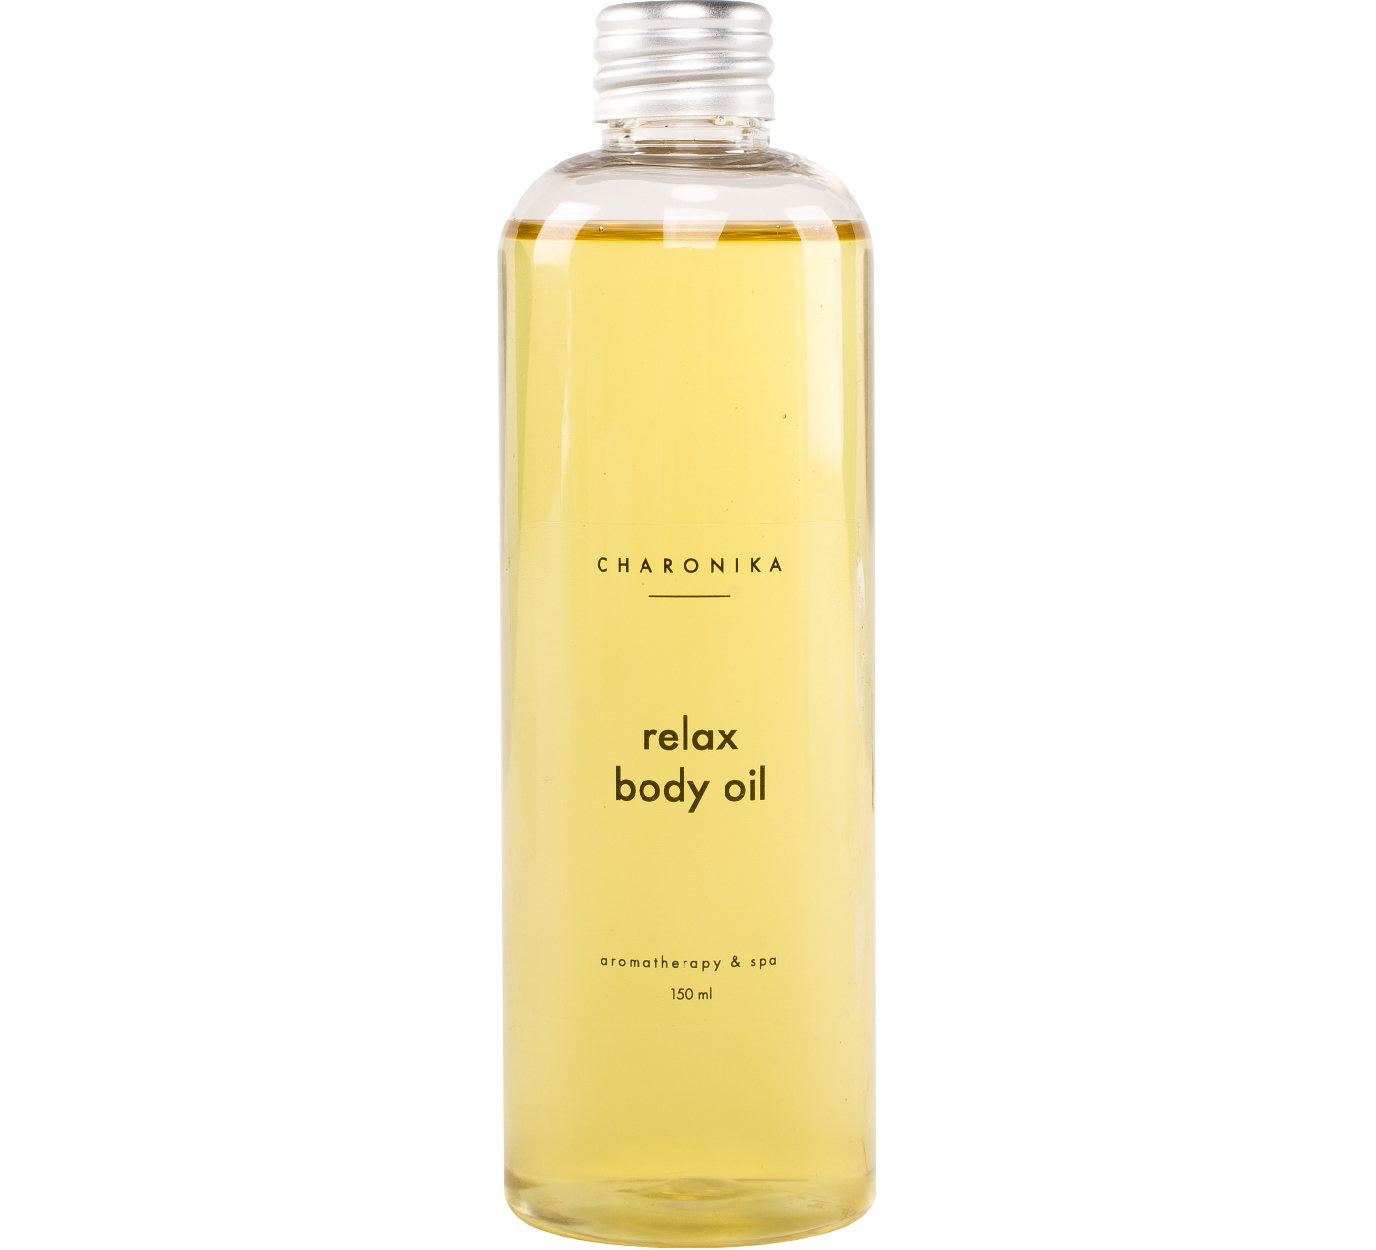 Масло CHARONIKA Relax body oil для тела расслабляющее 150 мл